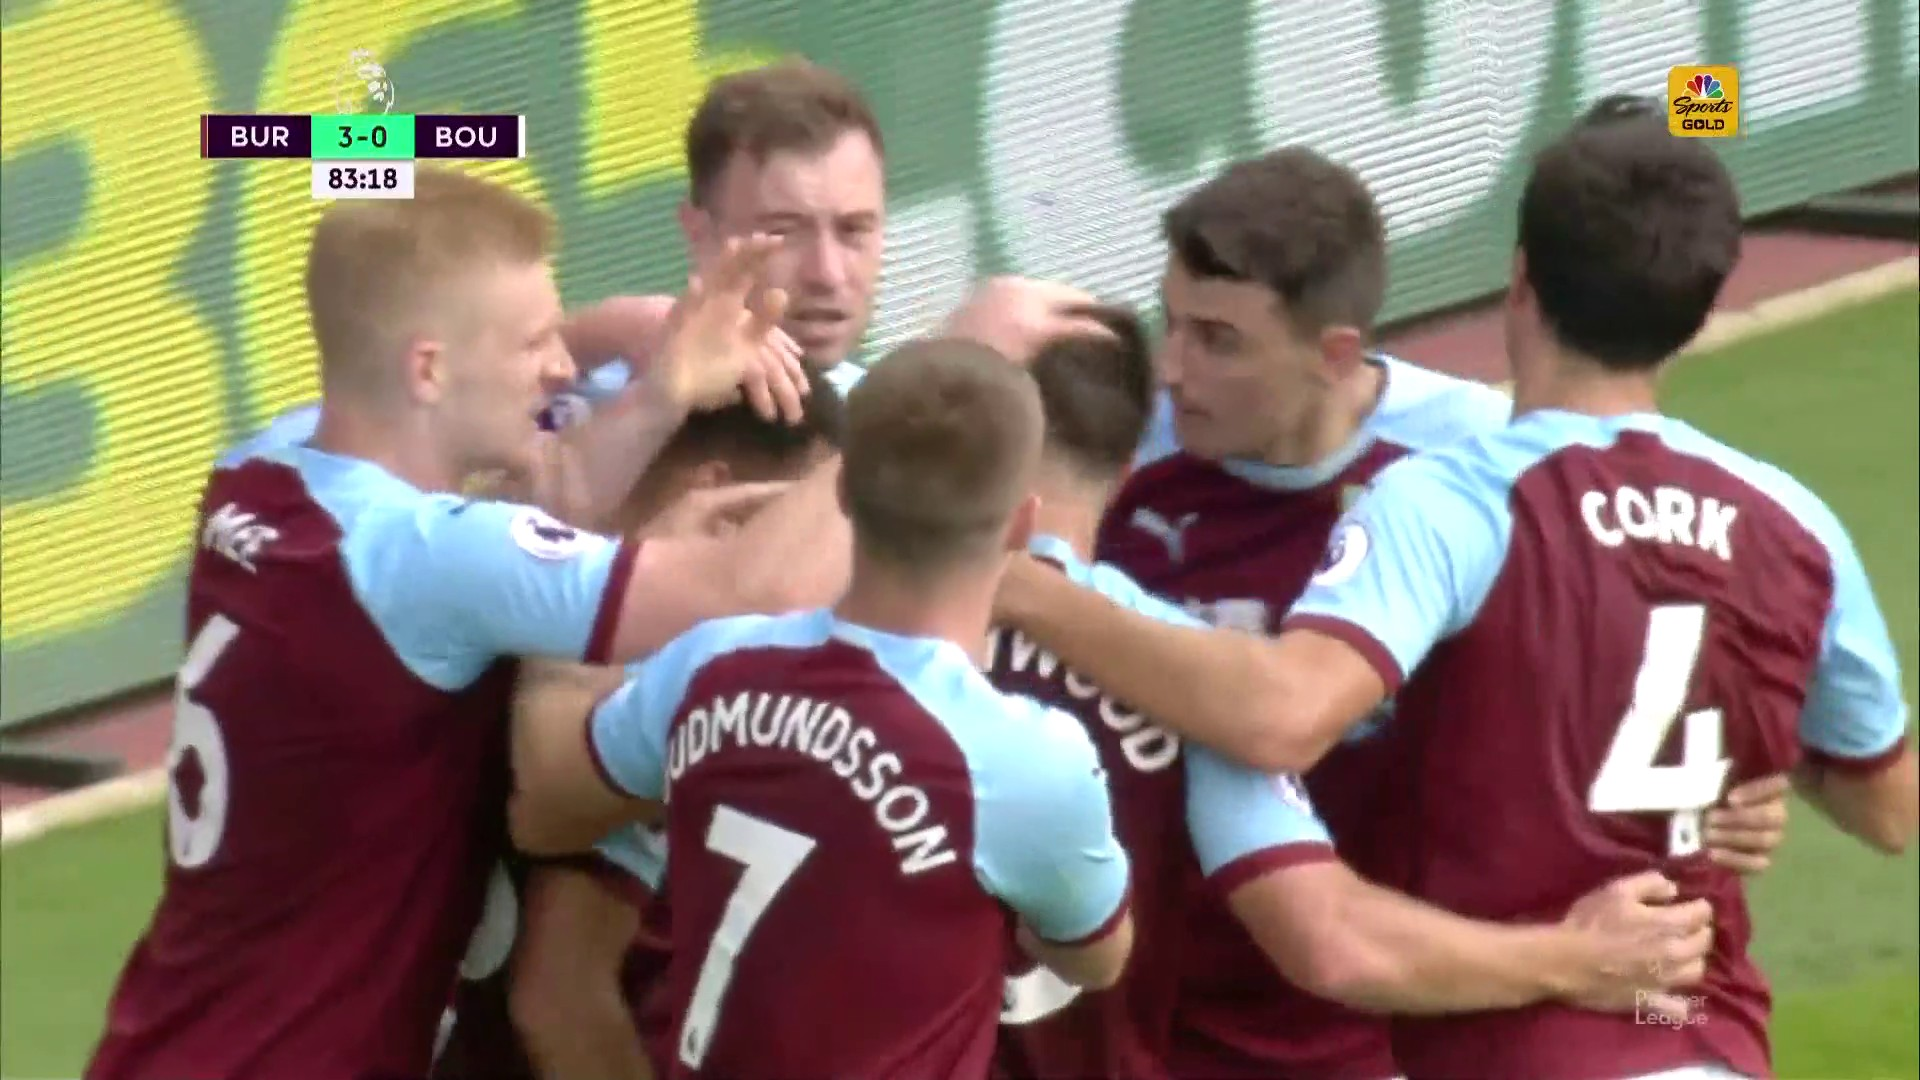 Ashley Barnes goal puts Burnley up 3-0 against Bournemouth